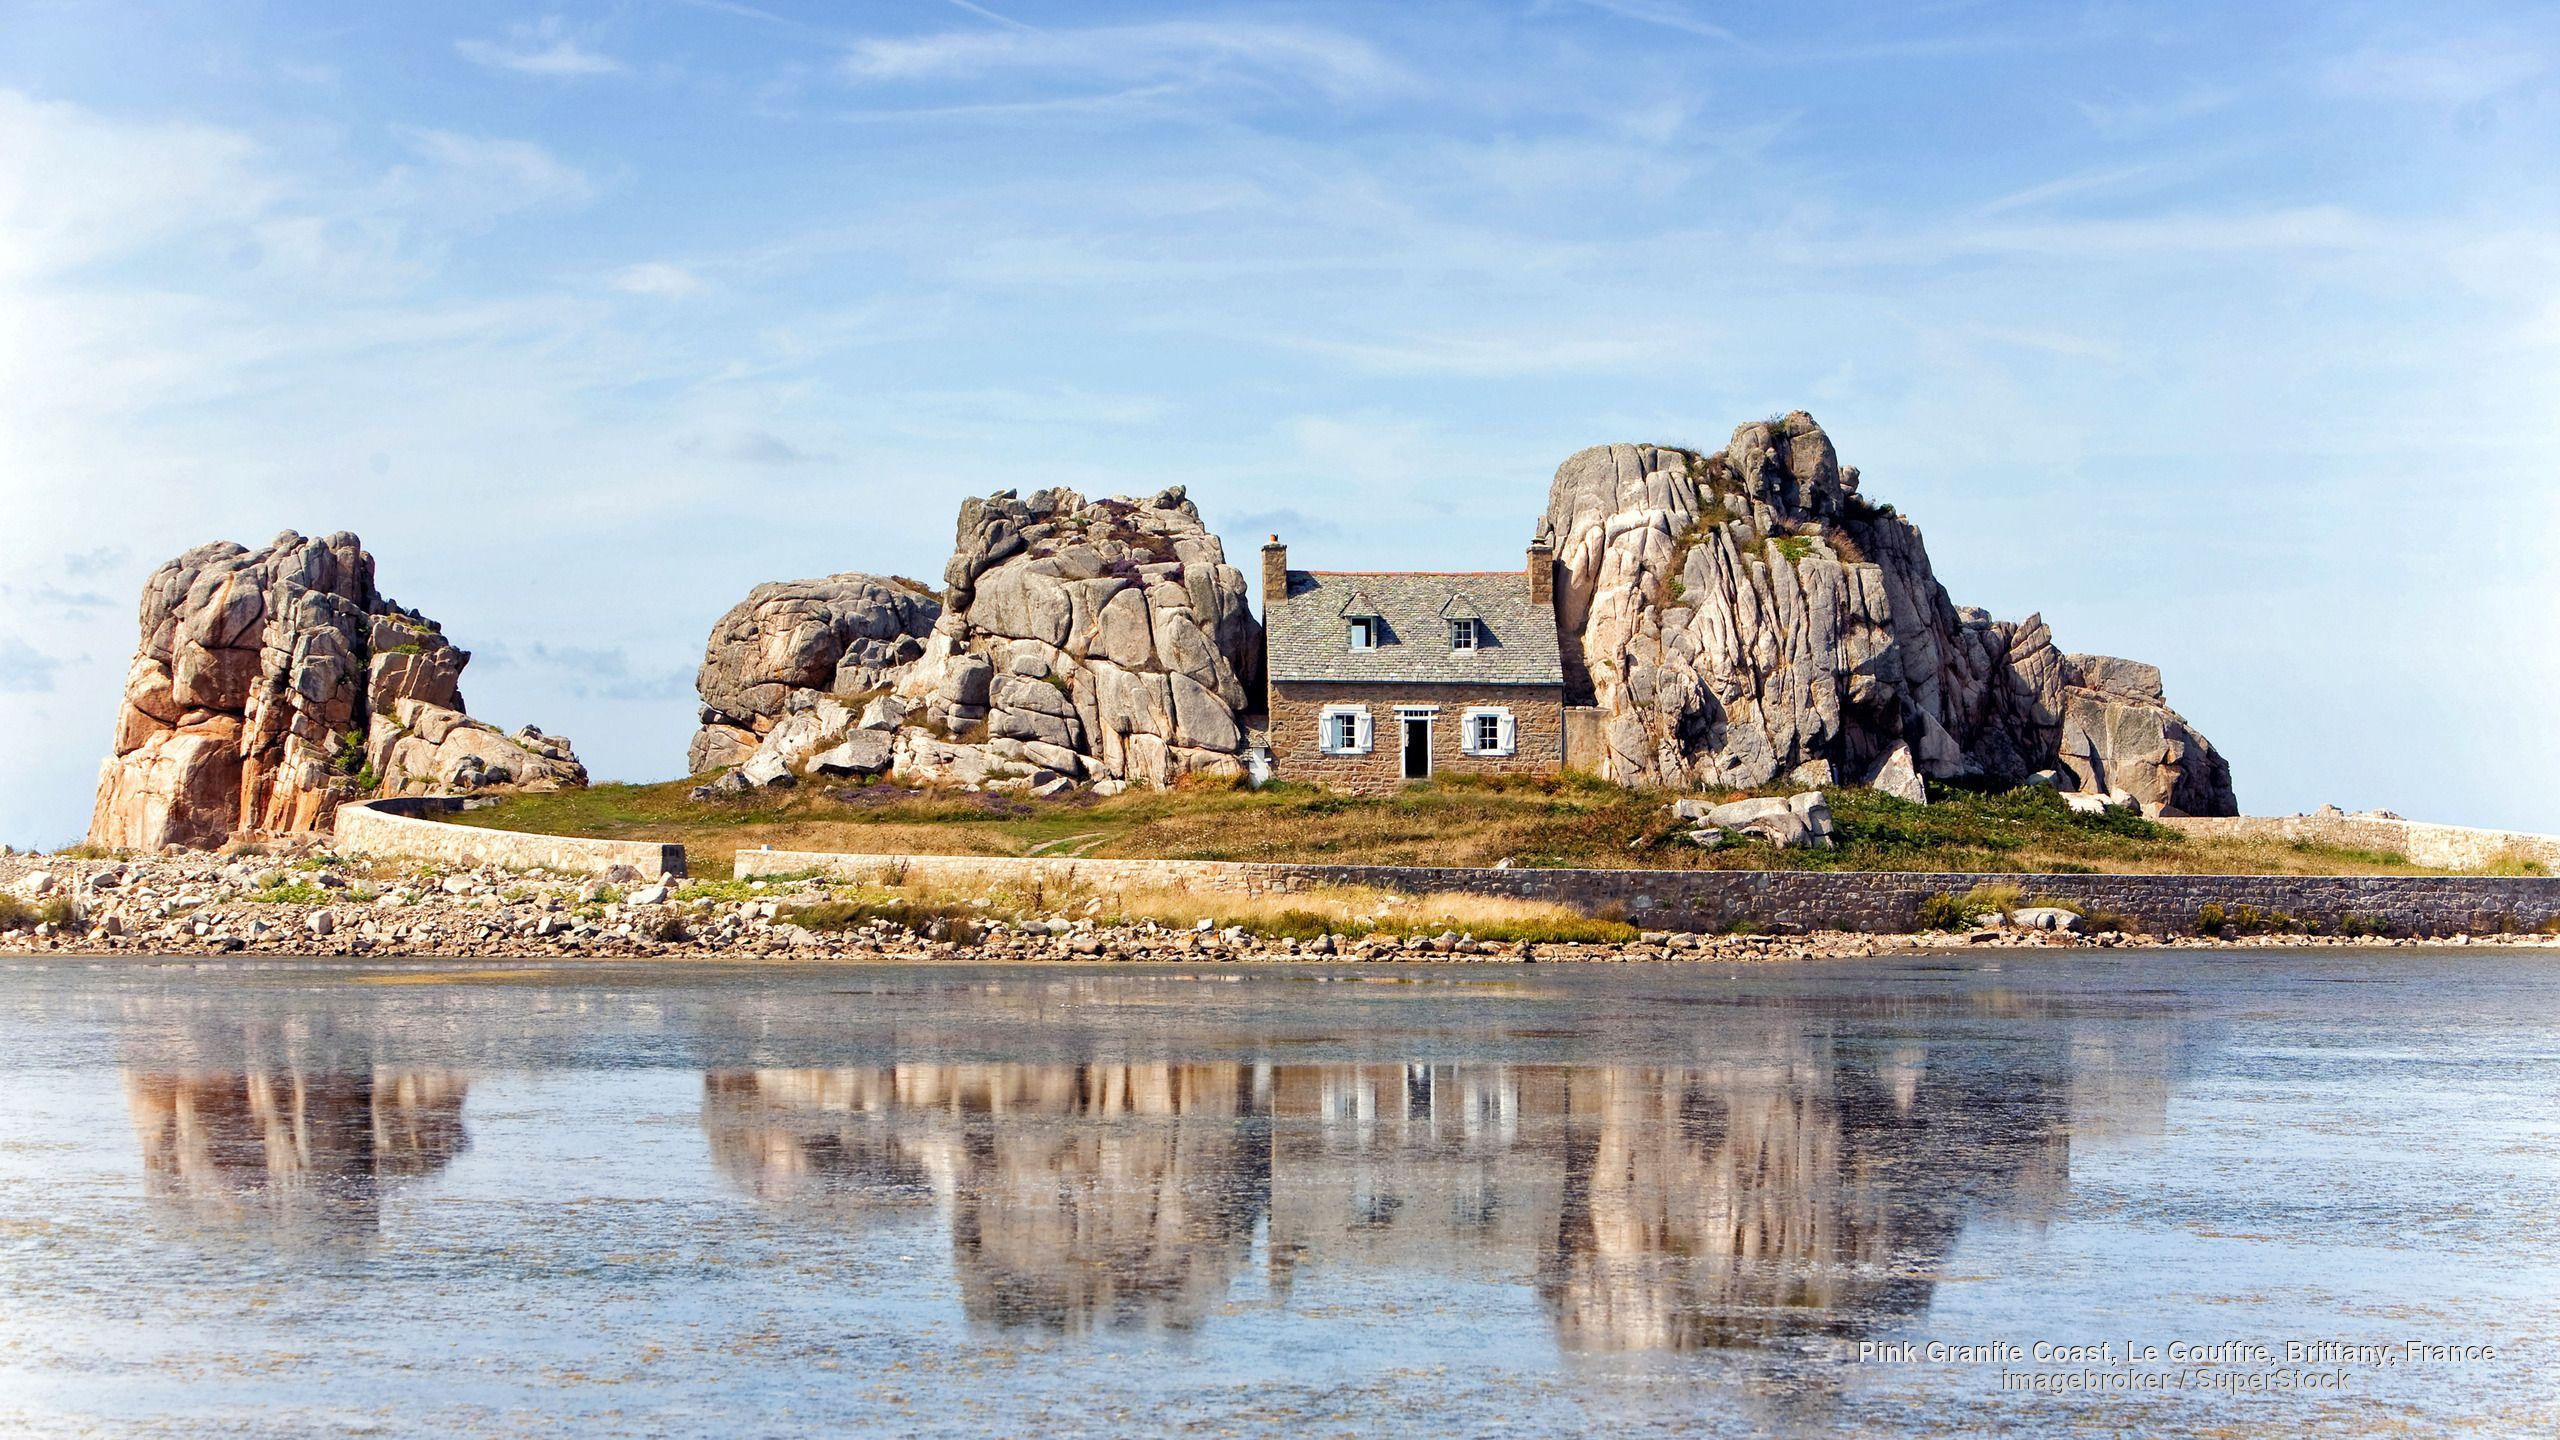 Pink Granite Coast, Le Gouffre, Brittany, France Francia